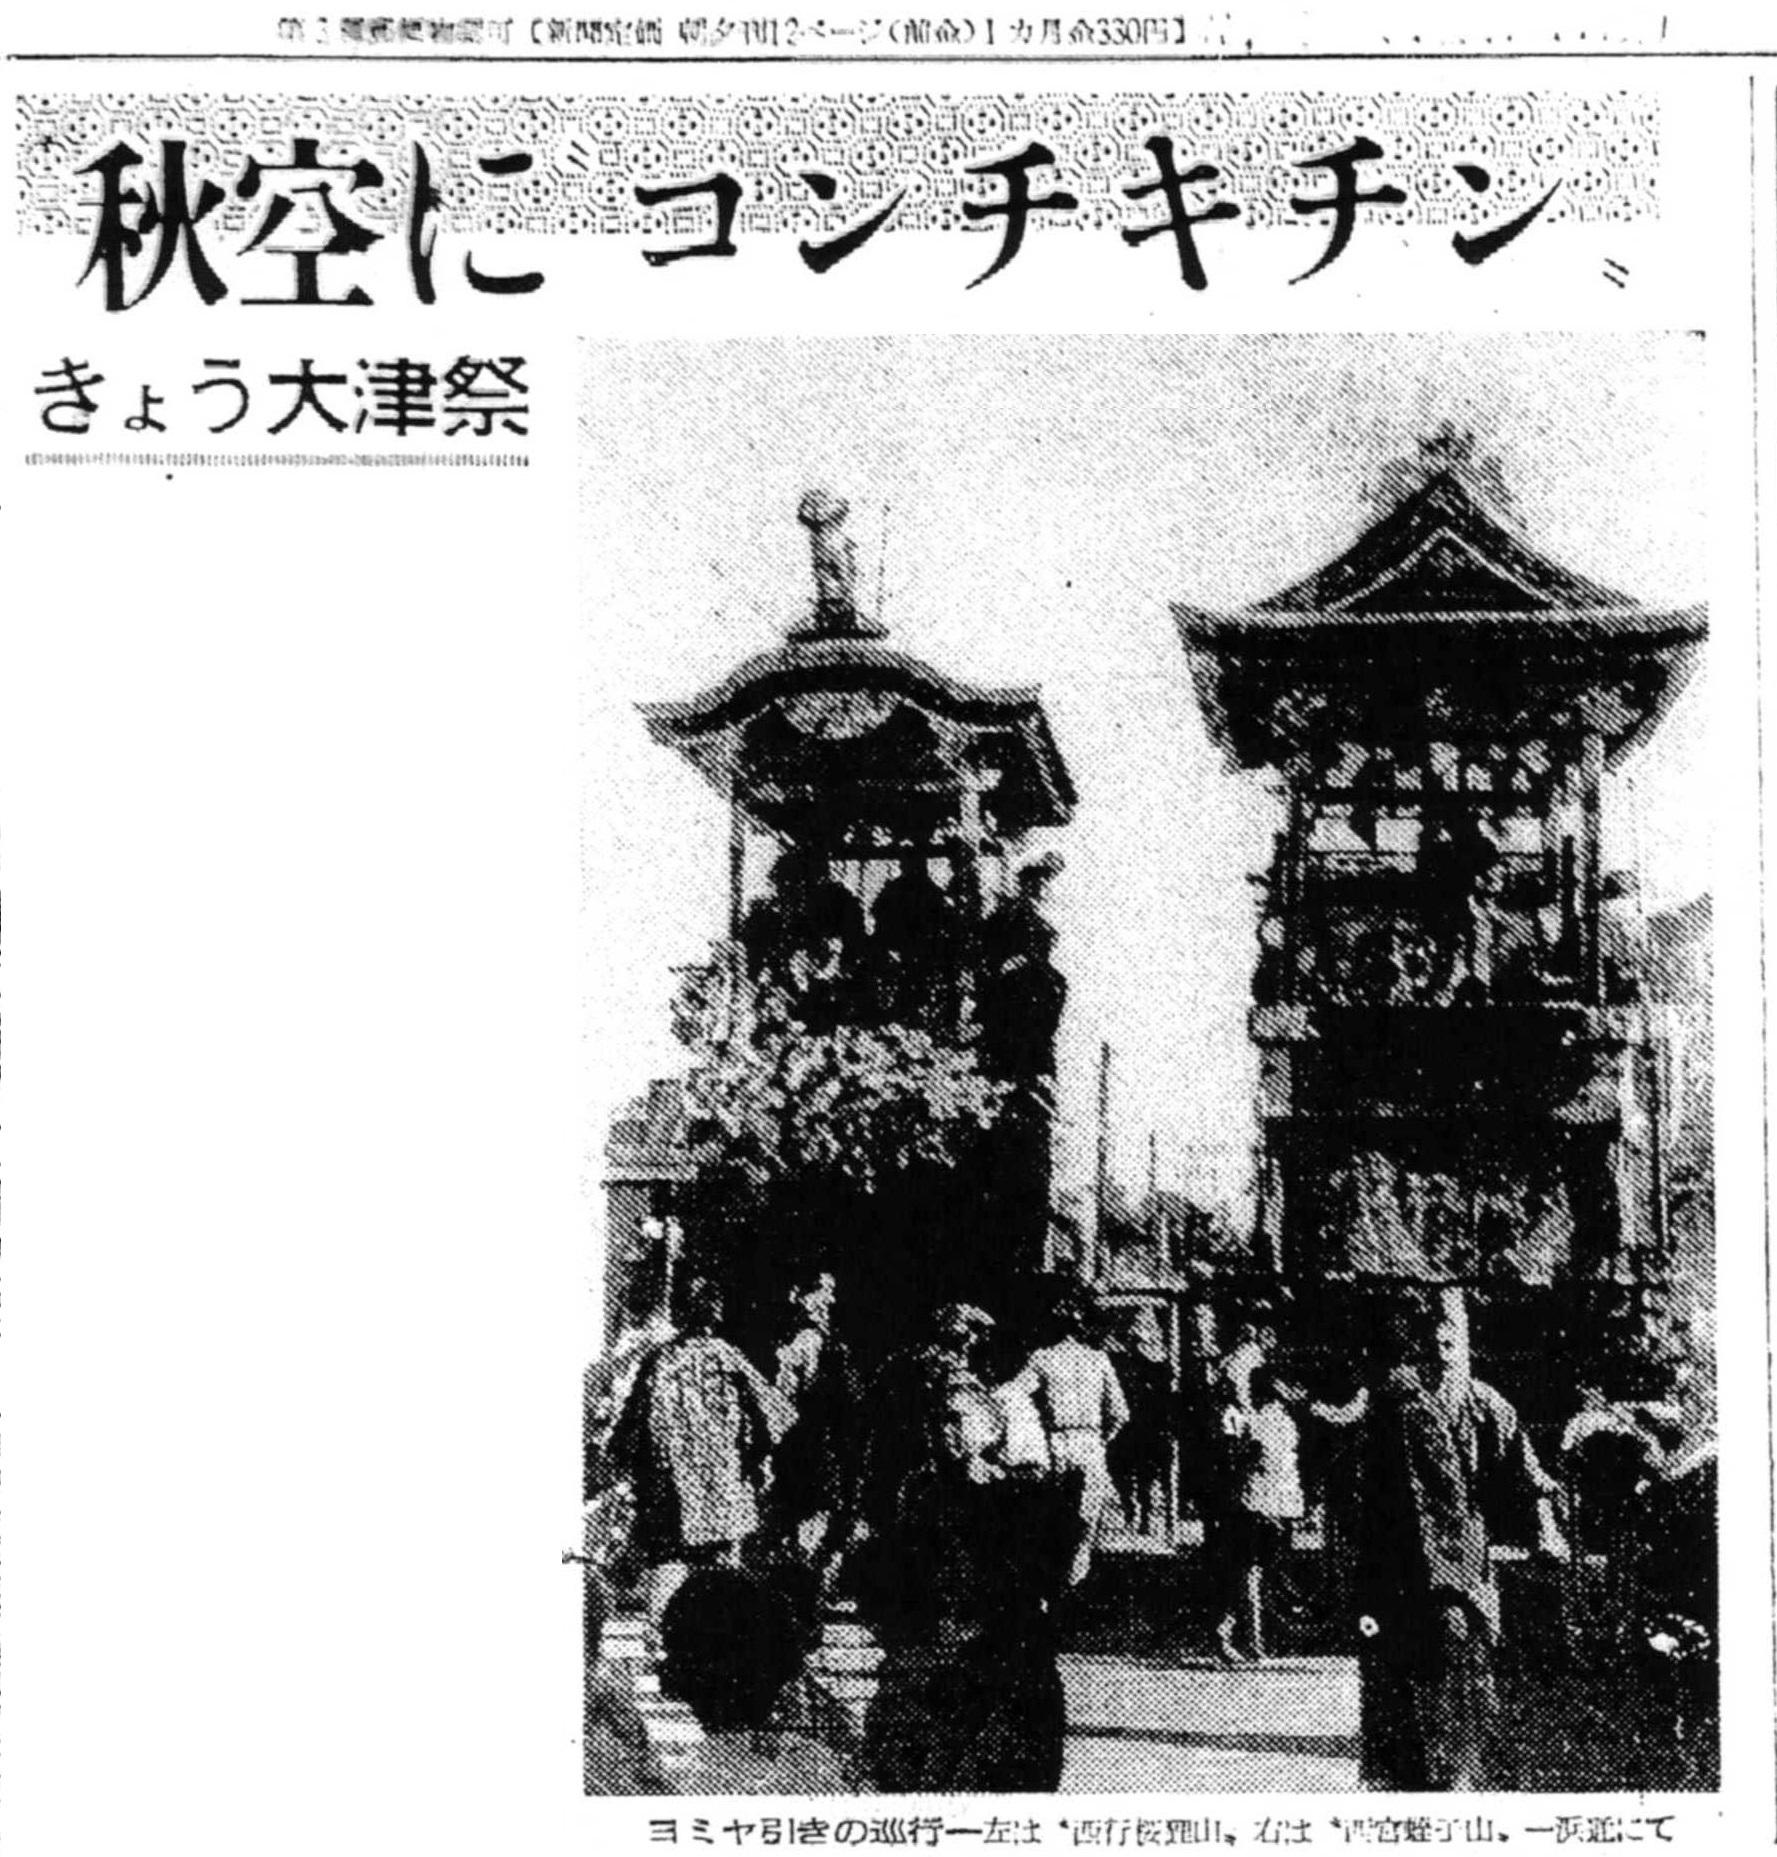 S30.10.10KS 大津‐堅田間に江若バスb2